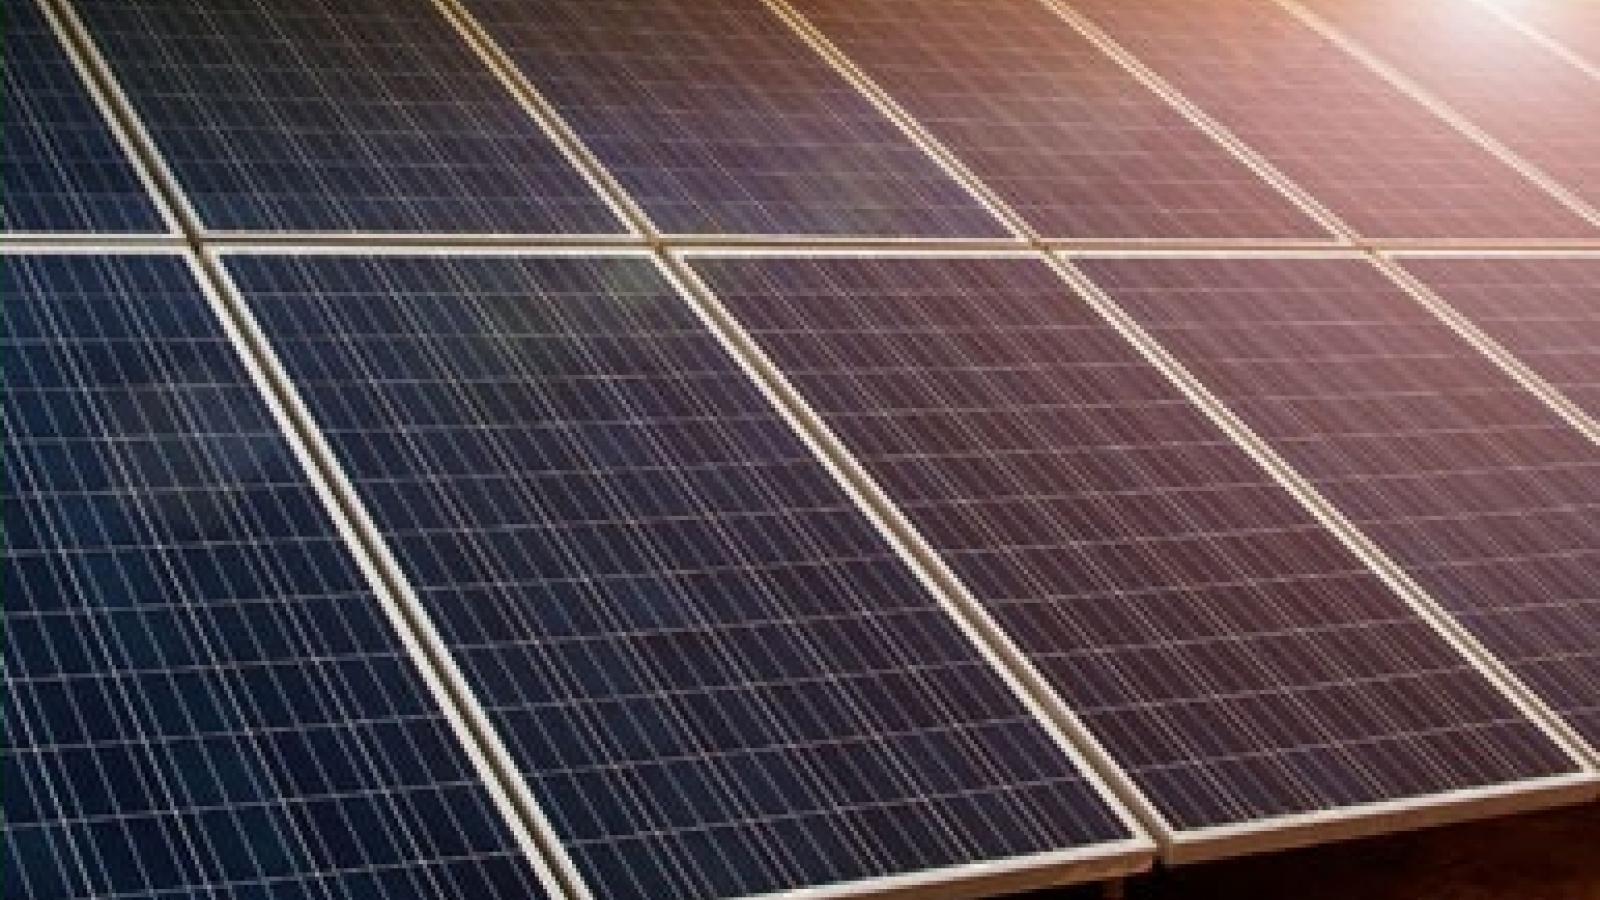 solar panels at a solar generation facility